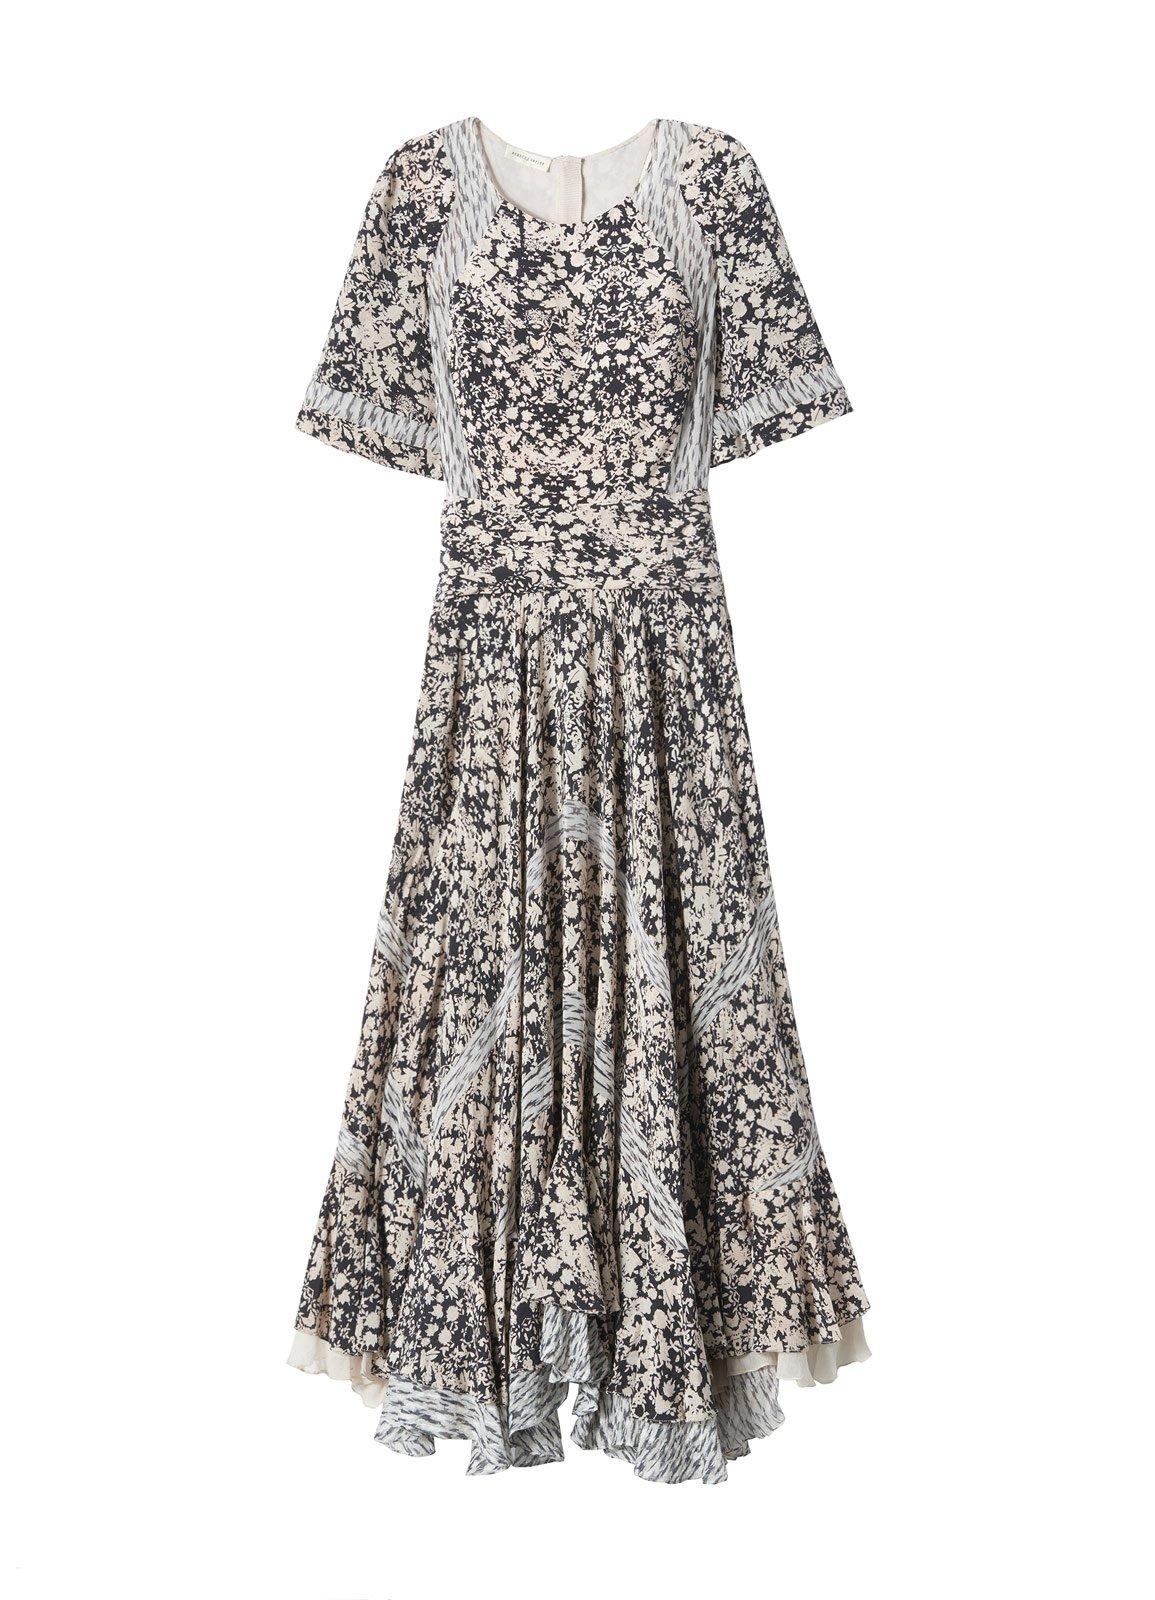 Lyst - Rebecca Taylor Short Sleeve Print Mix Dress in Gray